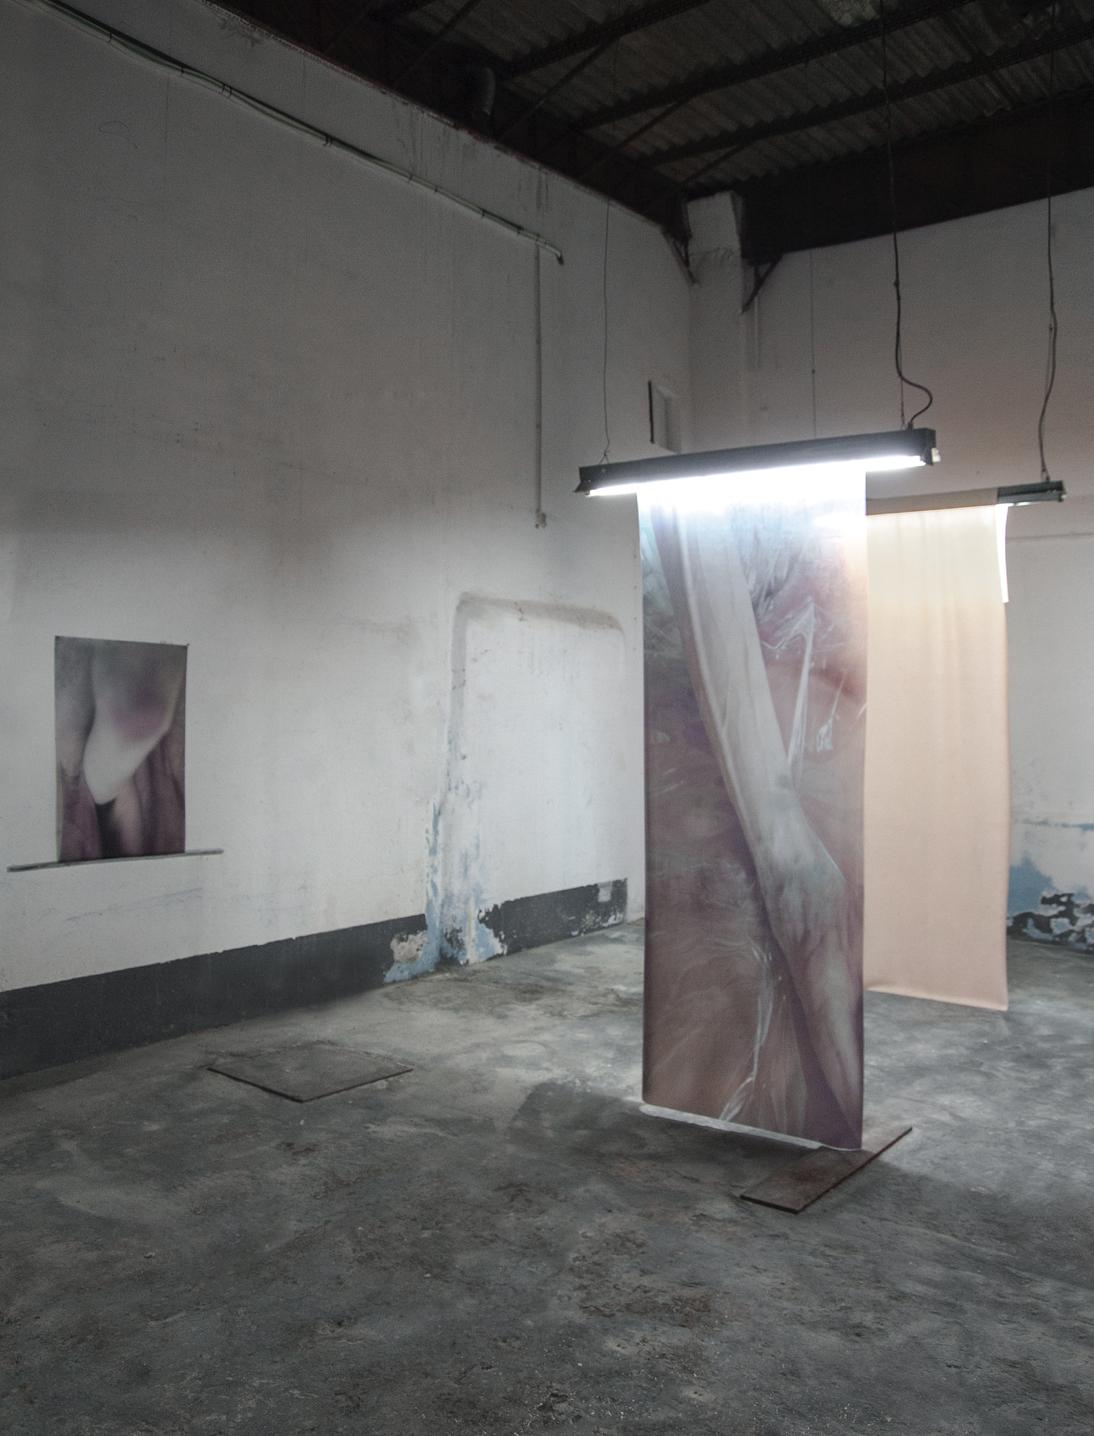 mia dudek tomaz hipolito body_recasts concrete installation